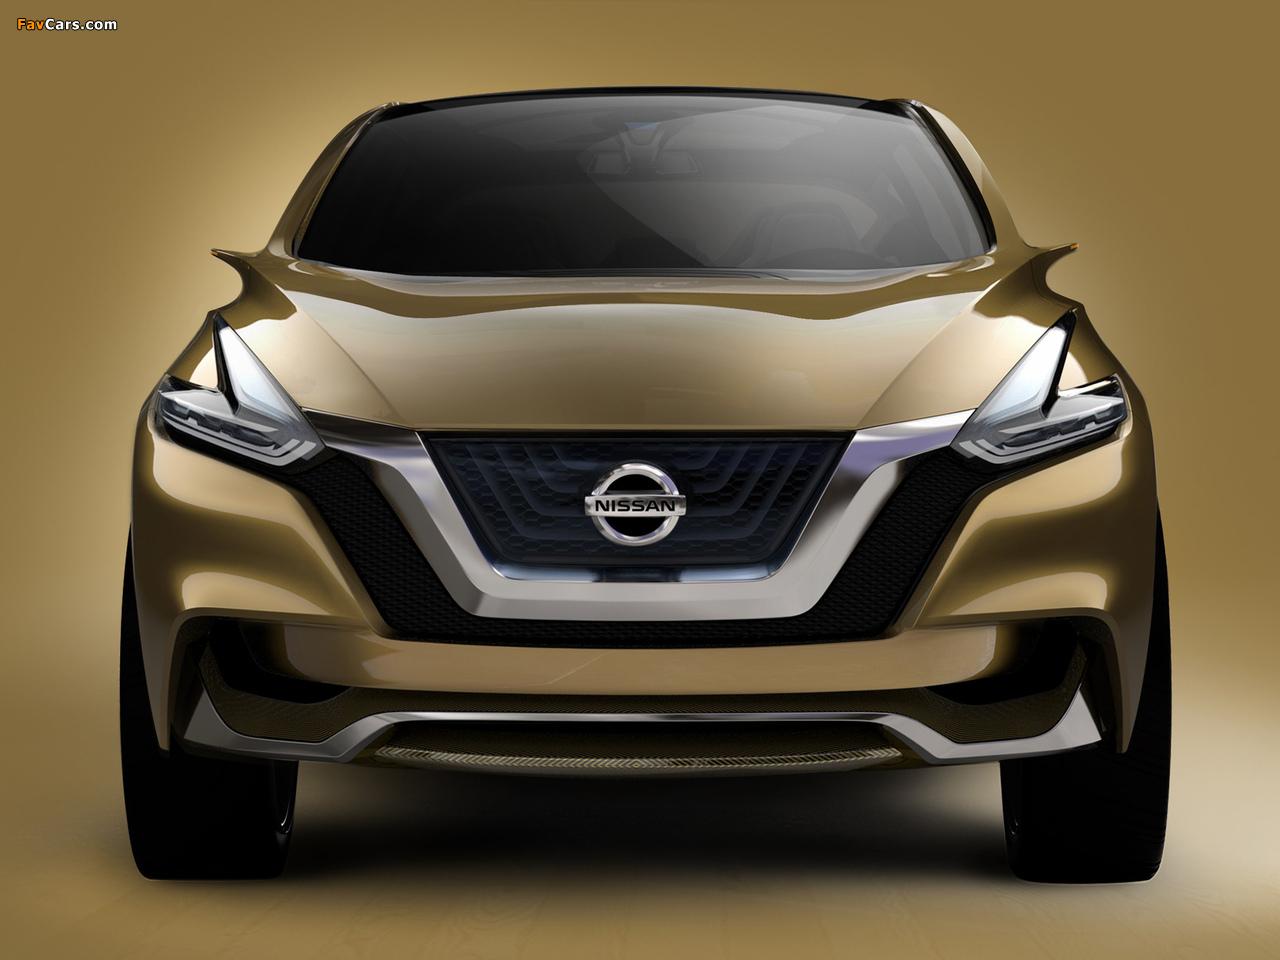 Nissan Resonance Concept 2013 pictures (1280 x 960)